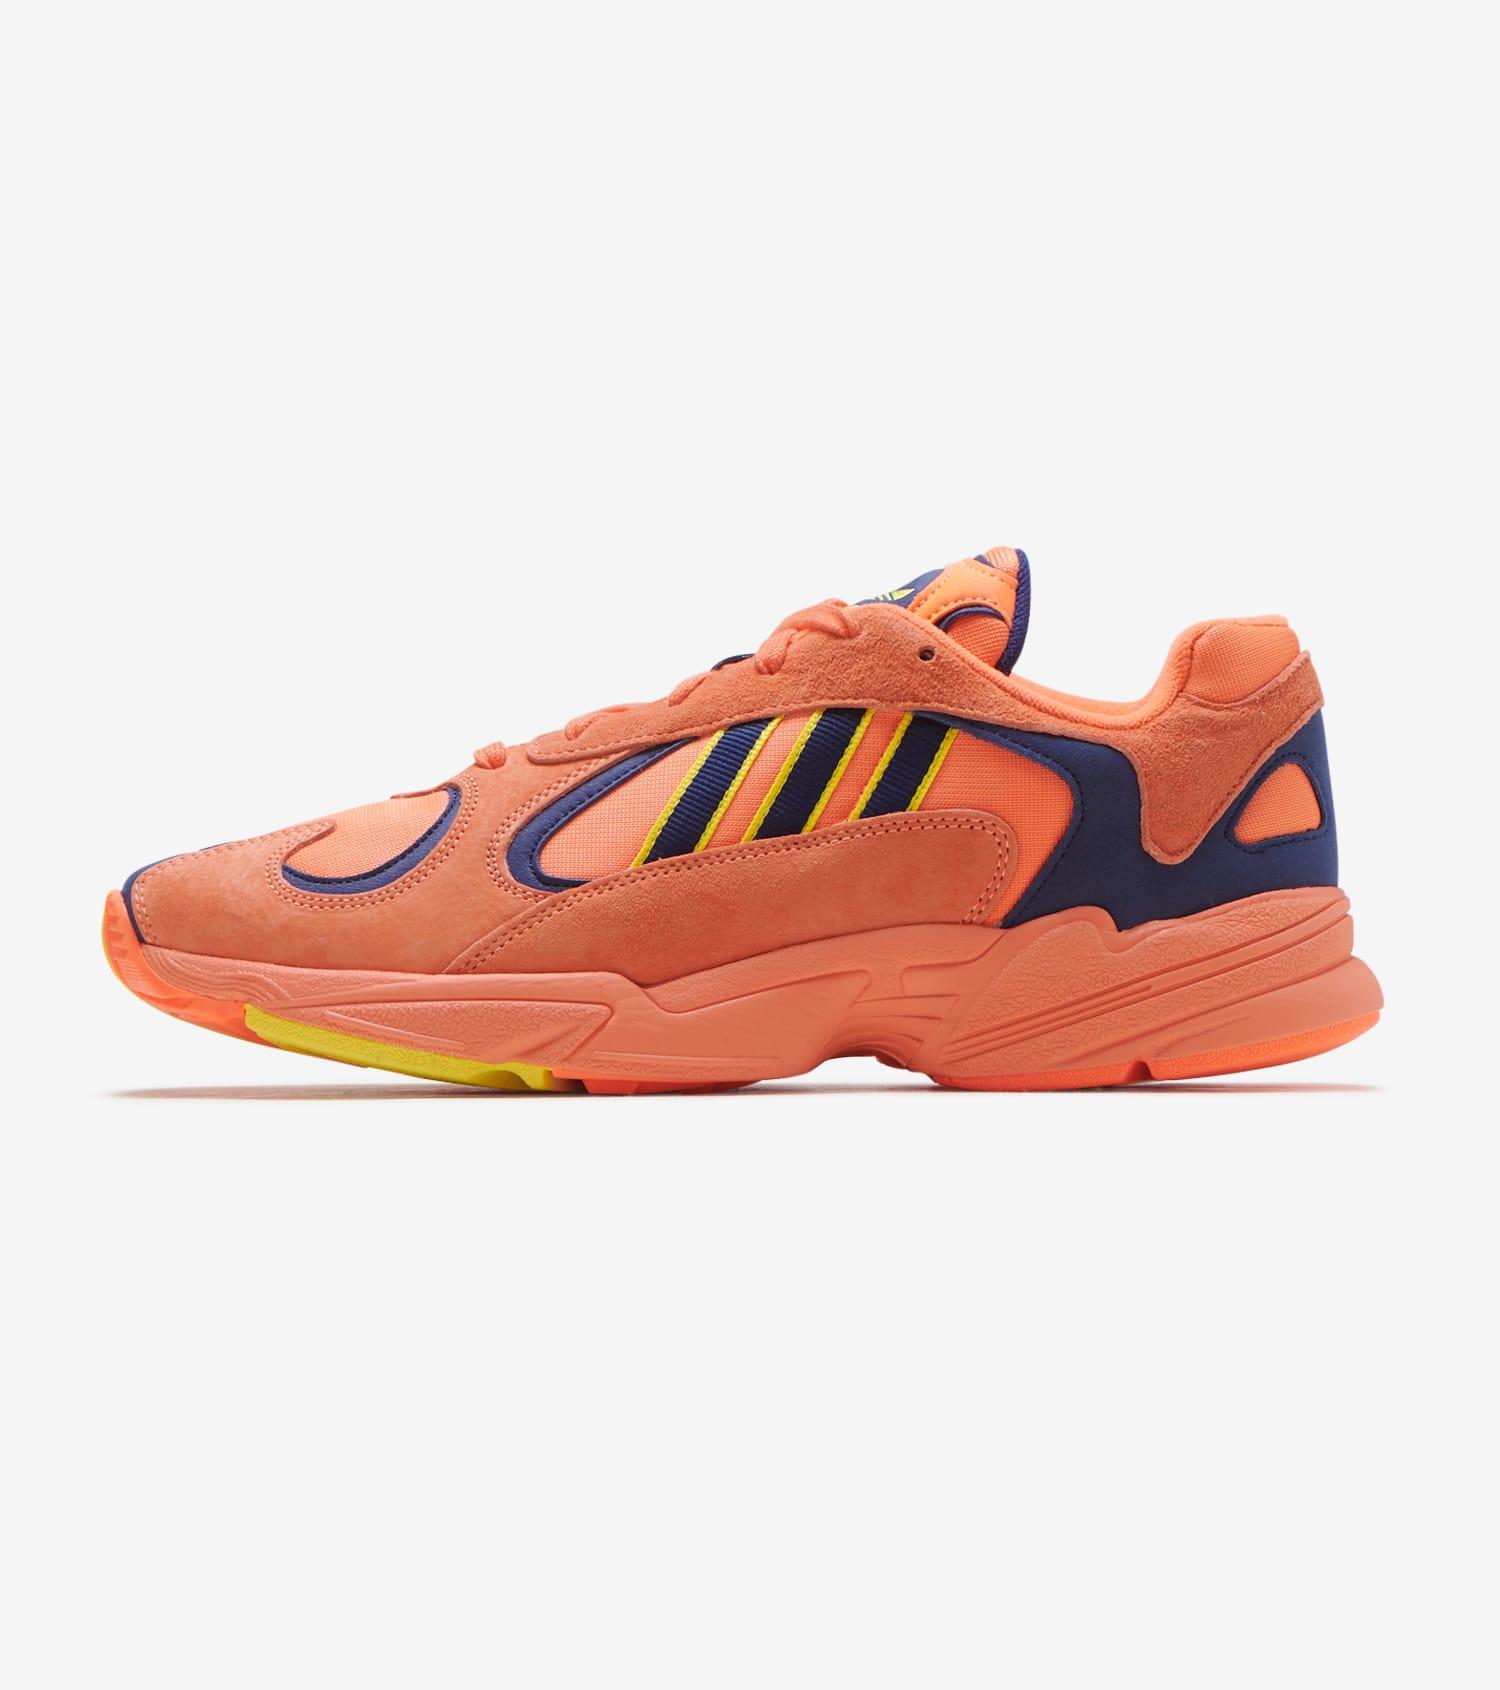 adidas Originals - Yung 1 - Sneaker in Orange, B37613